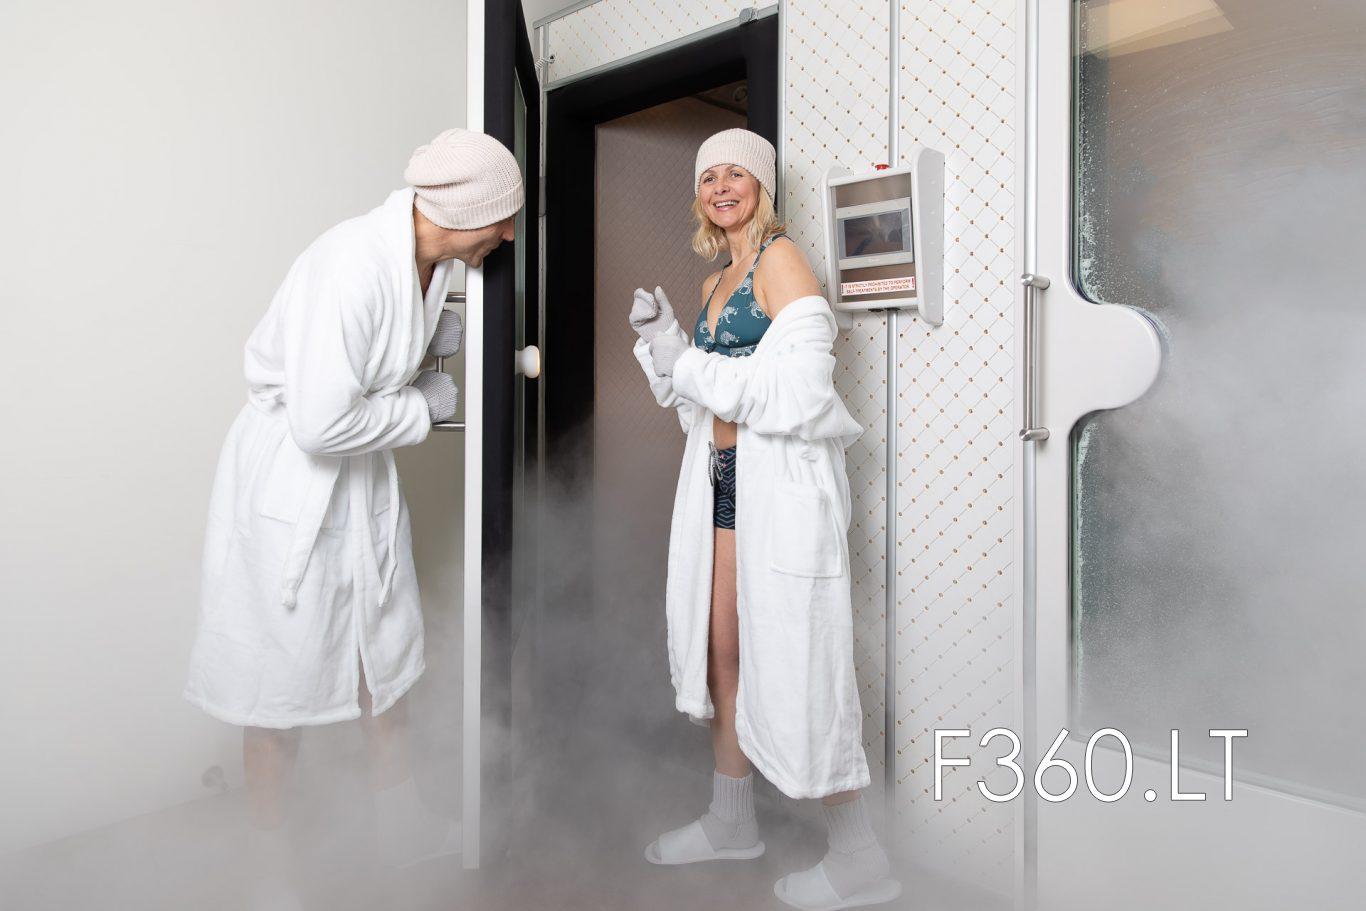 Lifestyle Stiliaus Fotosesijos Reklamai F360.lt 3t4a2733 Edit Edit